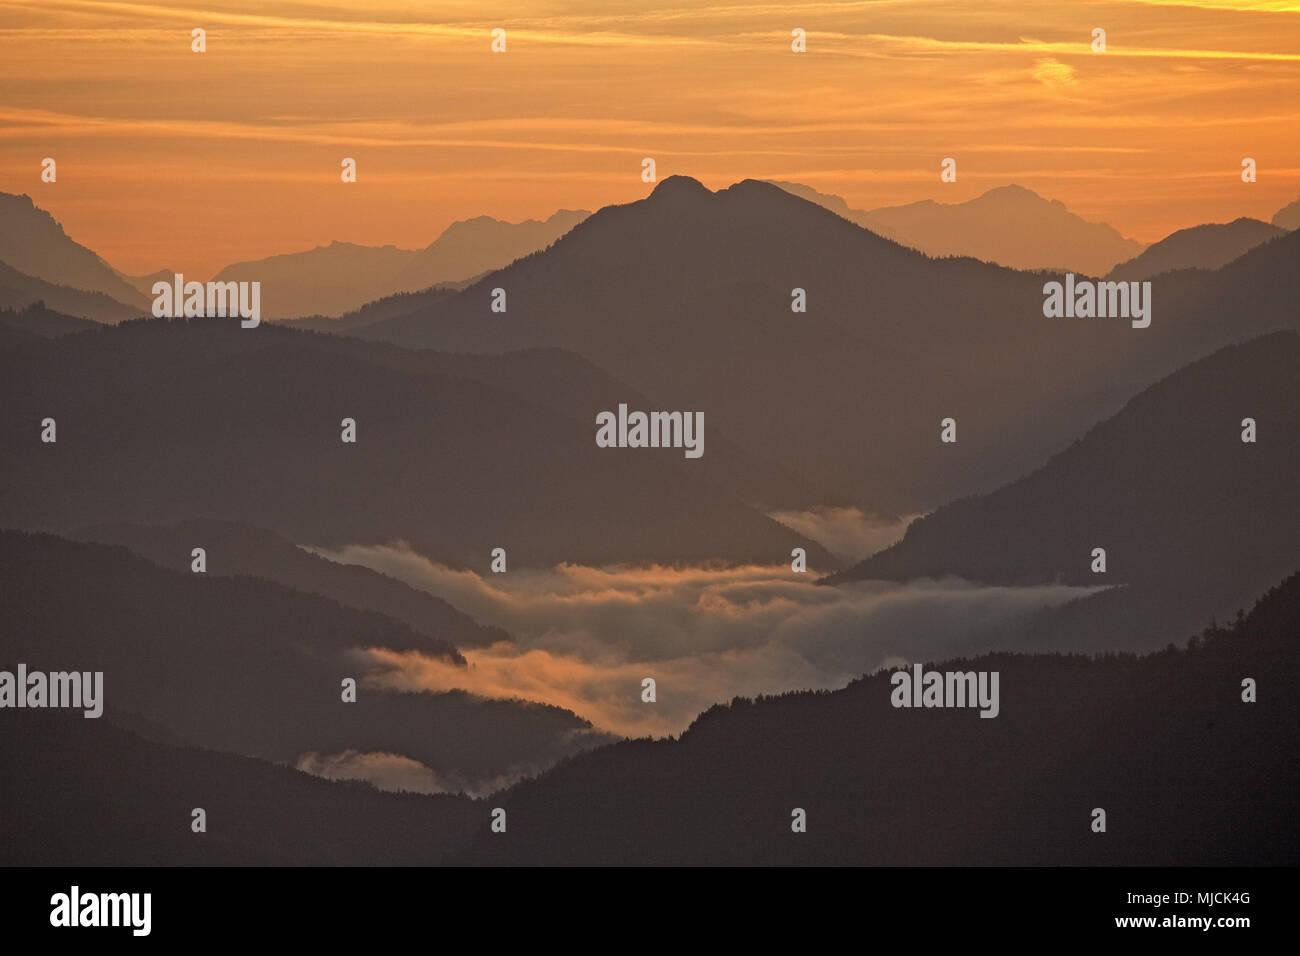 View of the Herzogstand to Tyrol, Schneidjoch, Bavarian Alpine Foreland, Alpine foreland, alps, Bavarian uplands, Upper Bavaria, Bavaria, South Germany, Germany, - Stock Image